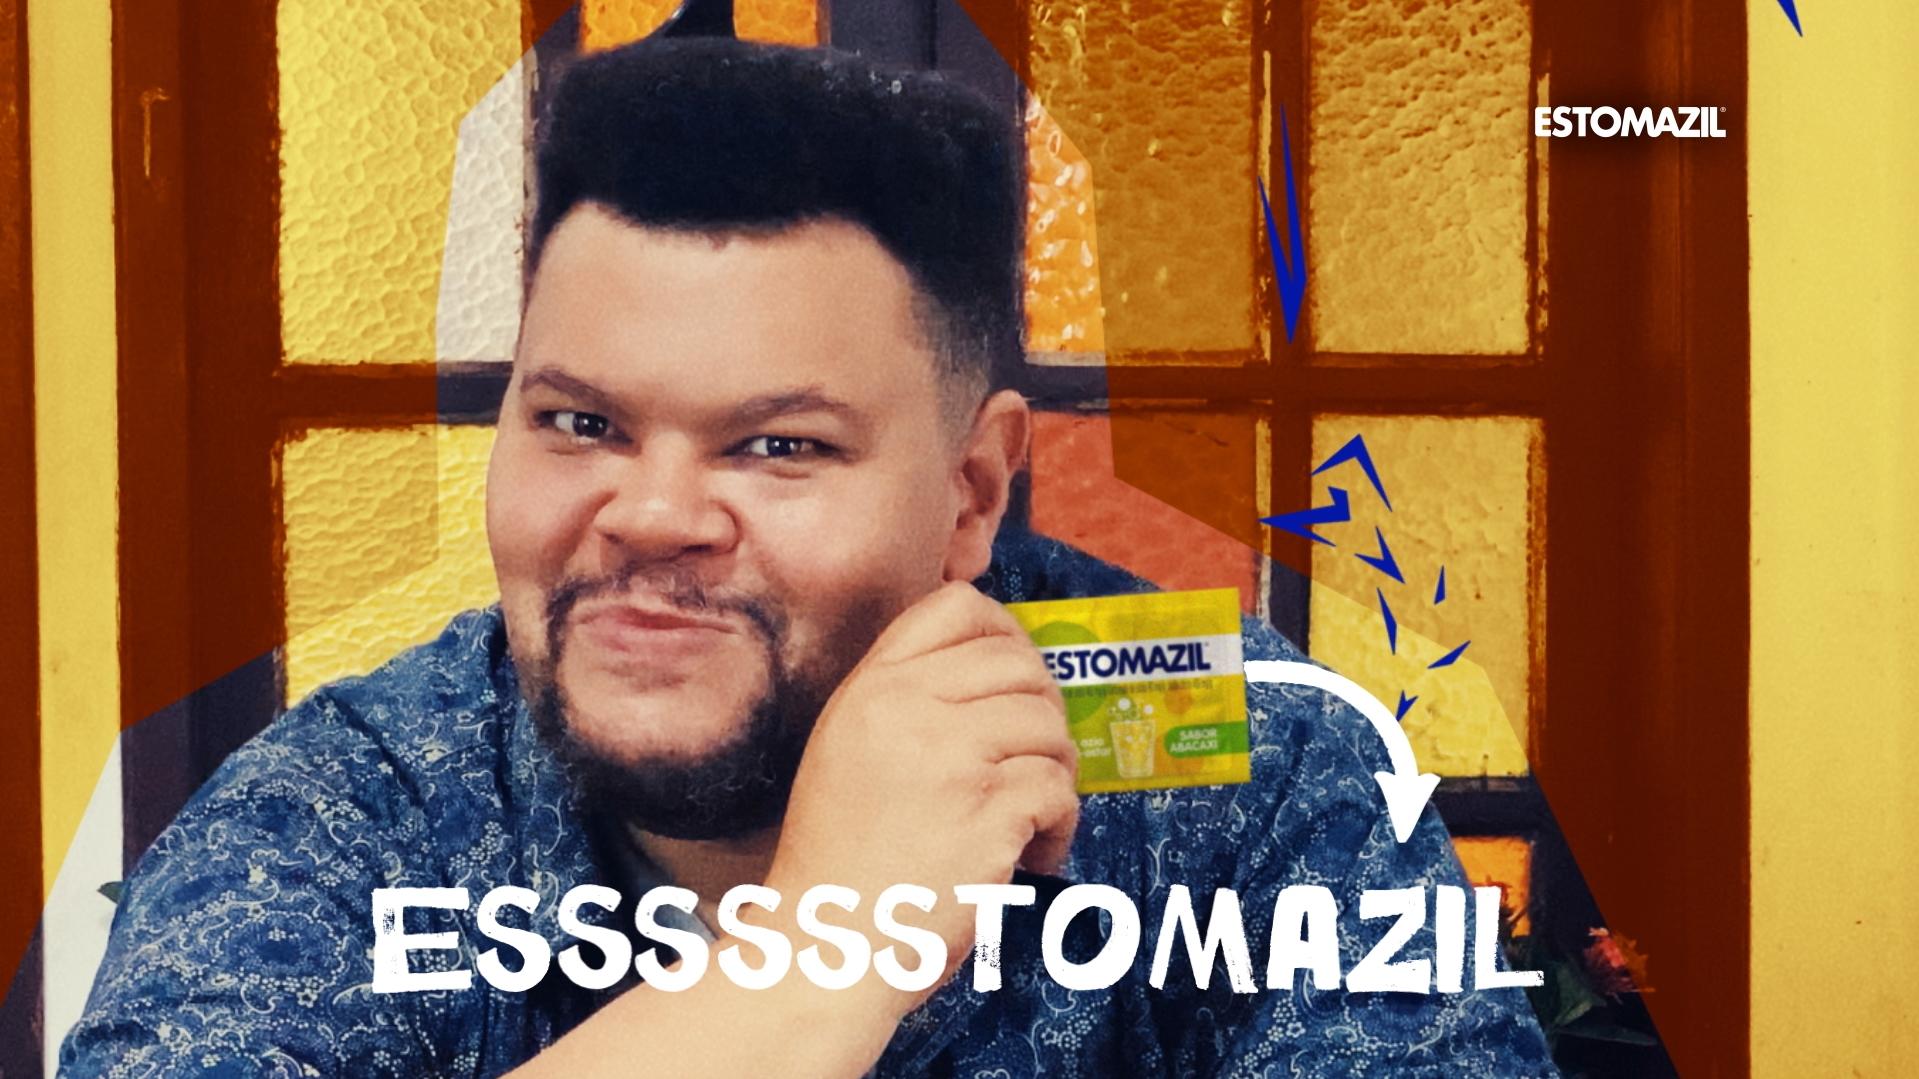 Babu Santana estrela a nova campanha de Estomazil - propmark